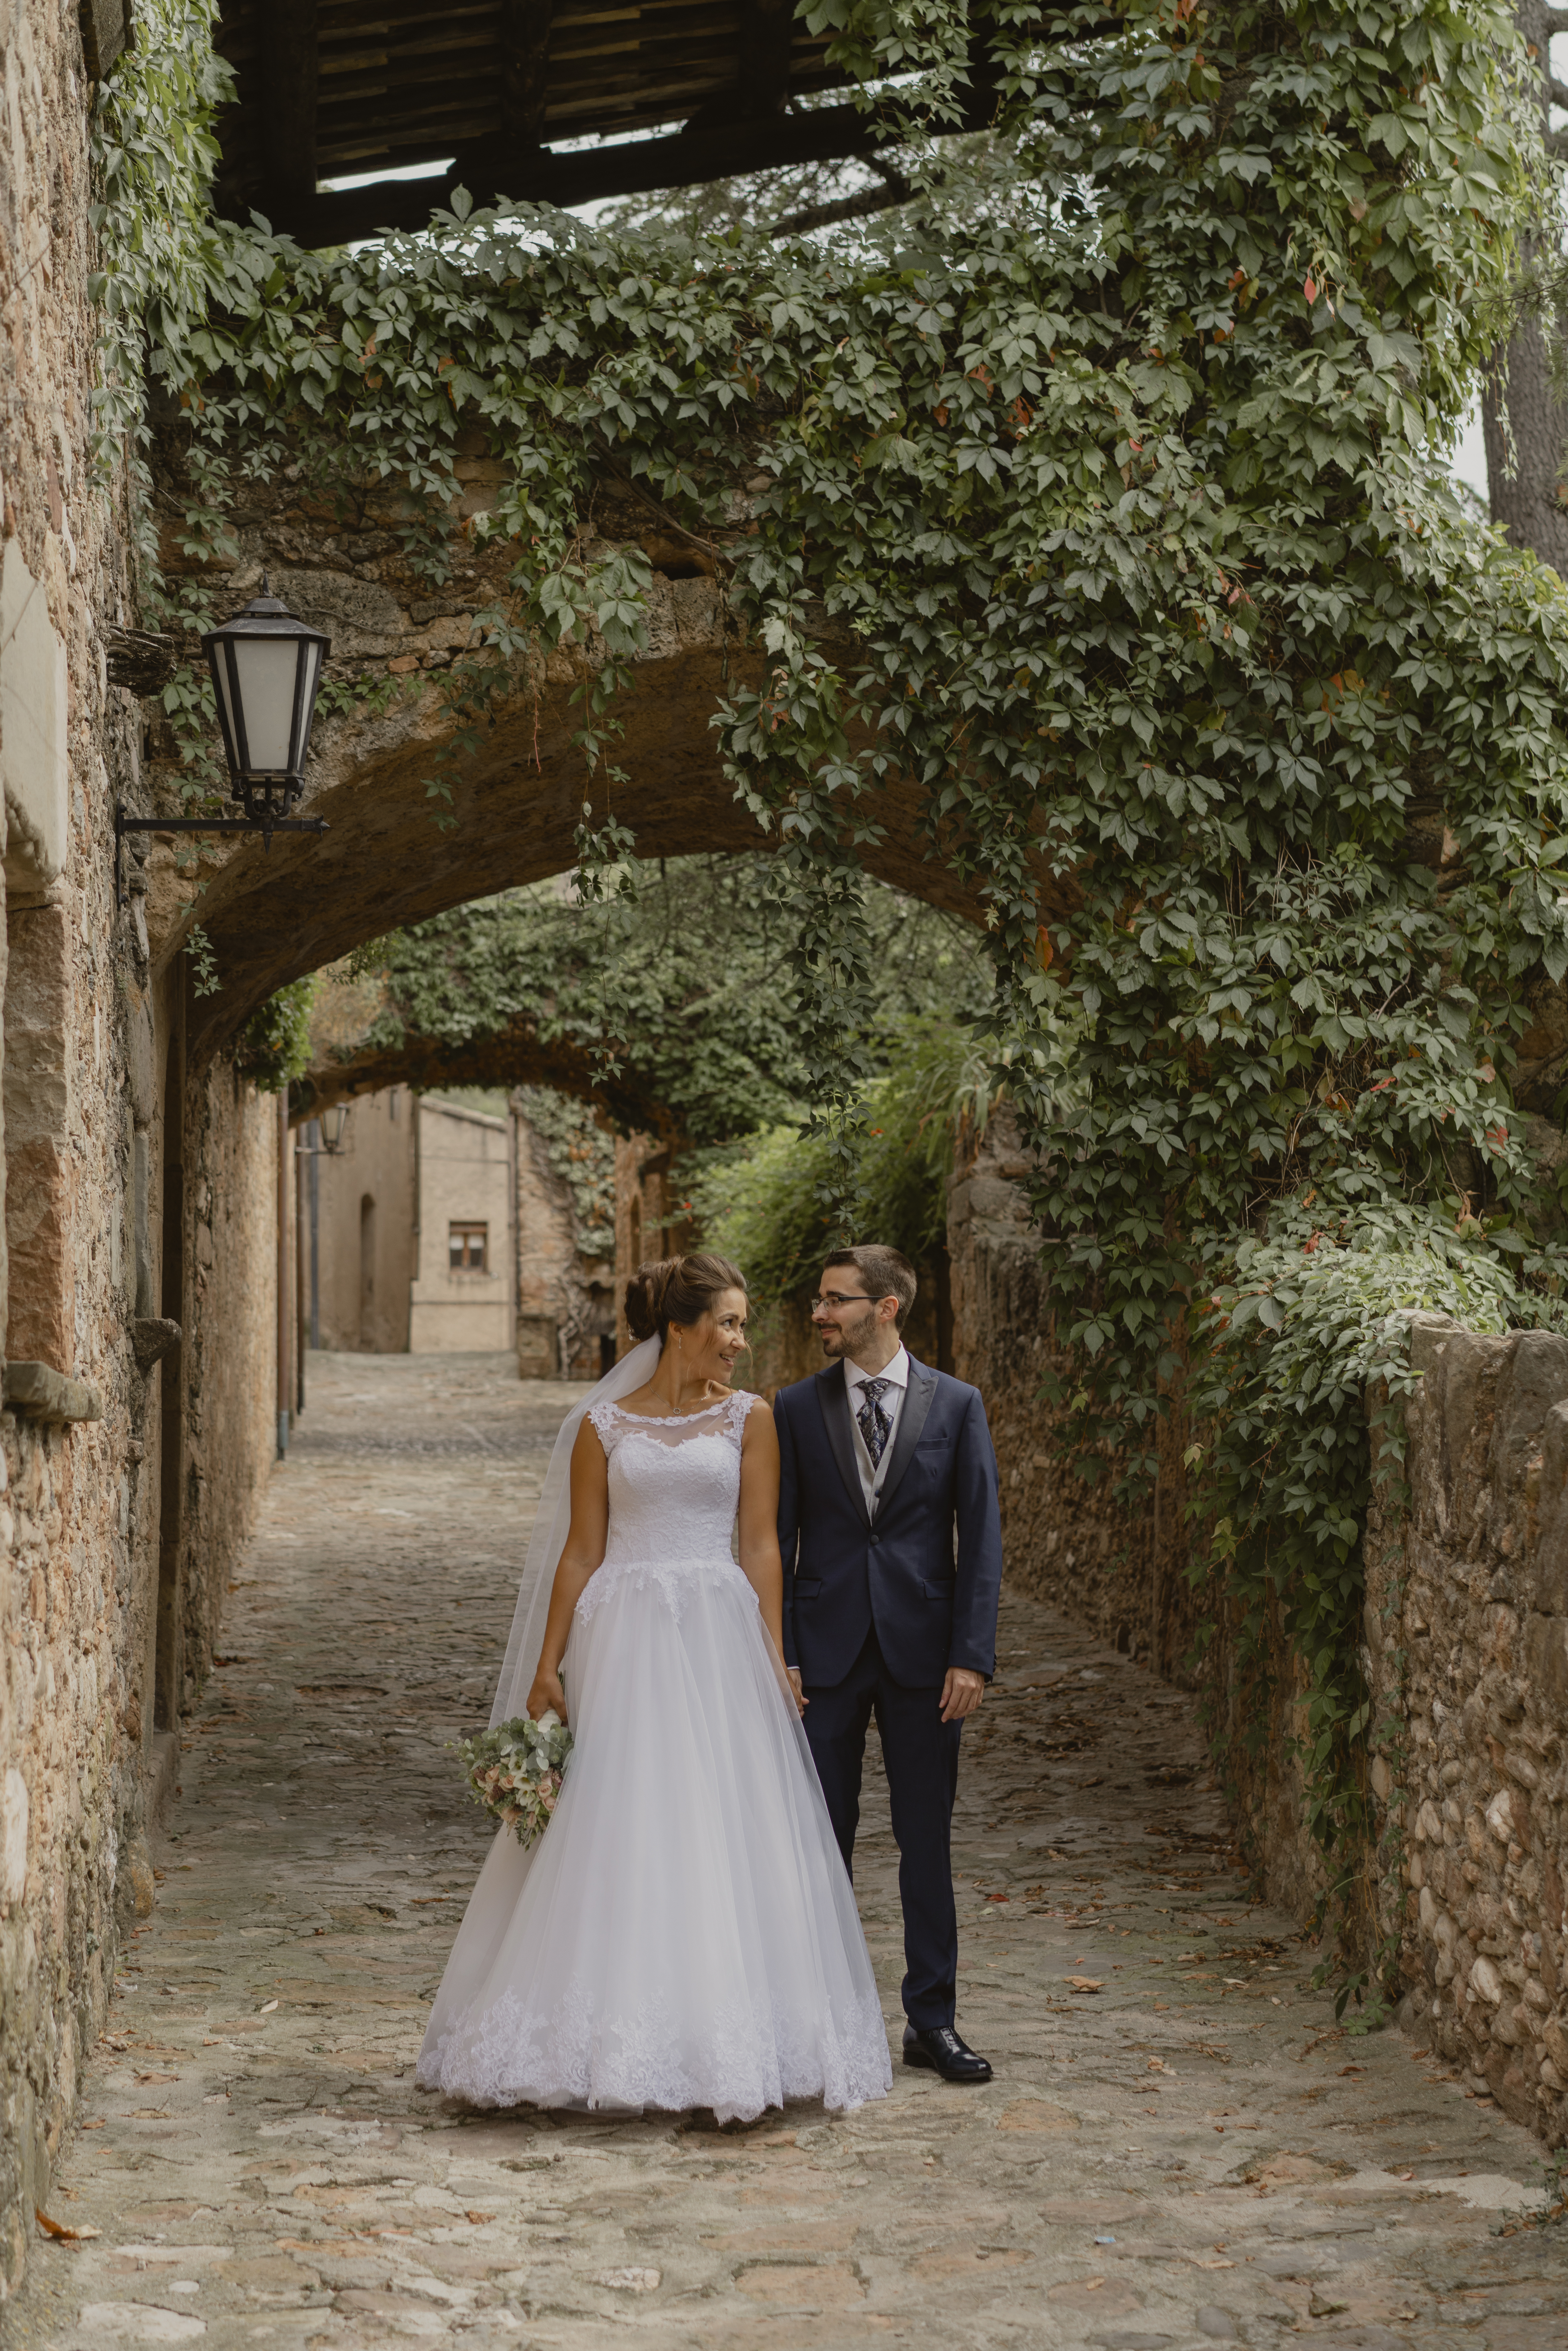 Sesión fotos boda y Prebdoda Barcelo